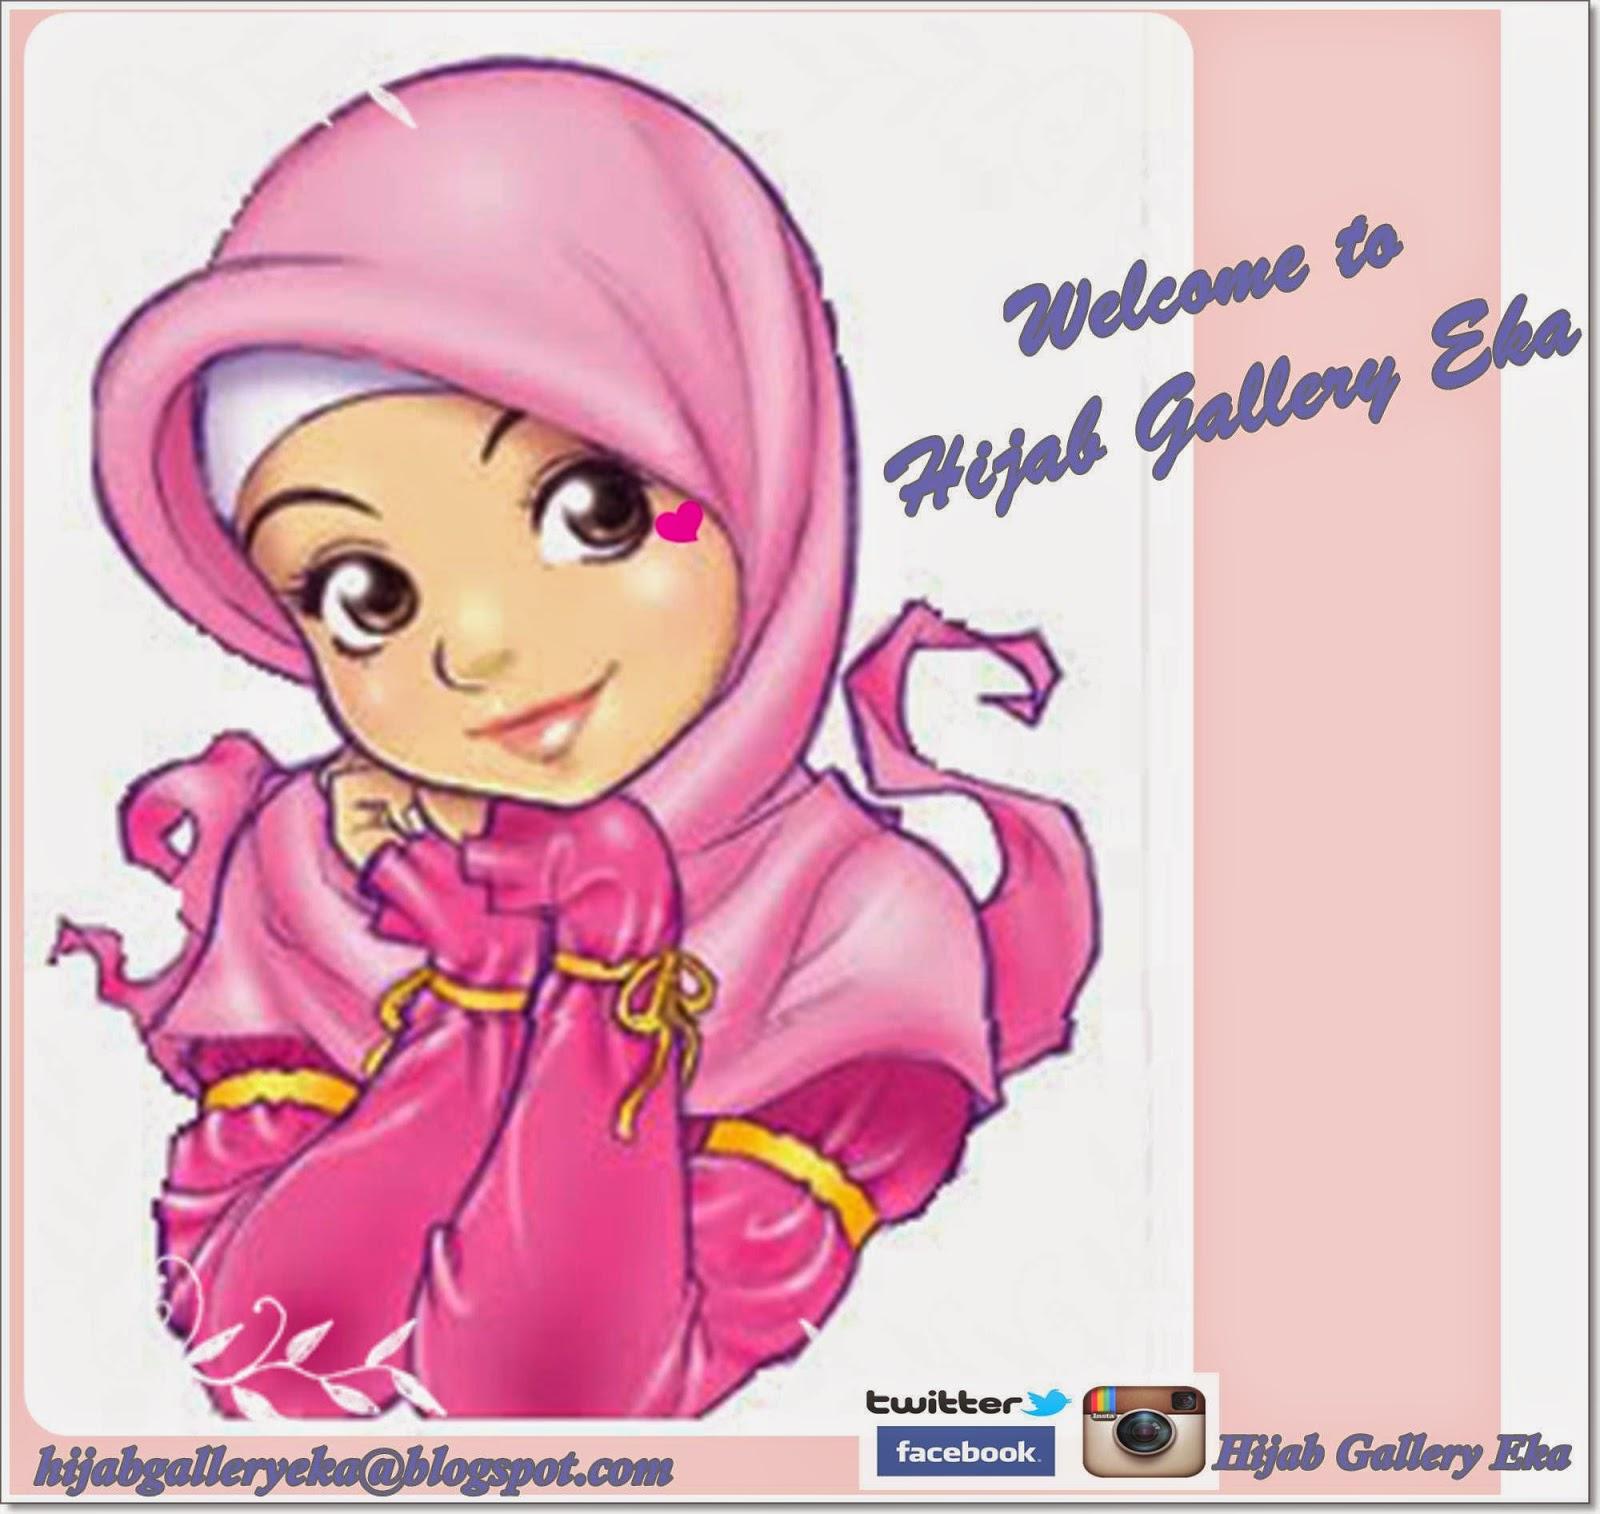 Gambar Kartun Muslimah Berjilbab Syar i Kolek Gambar